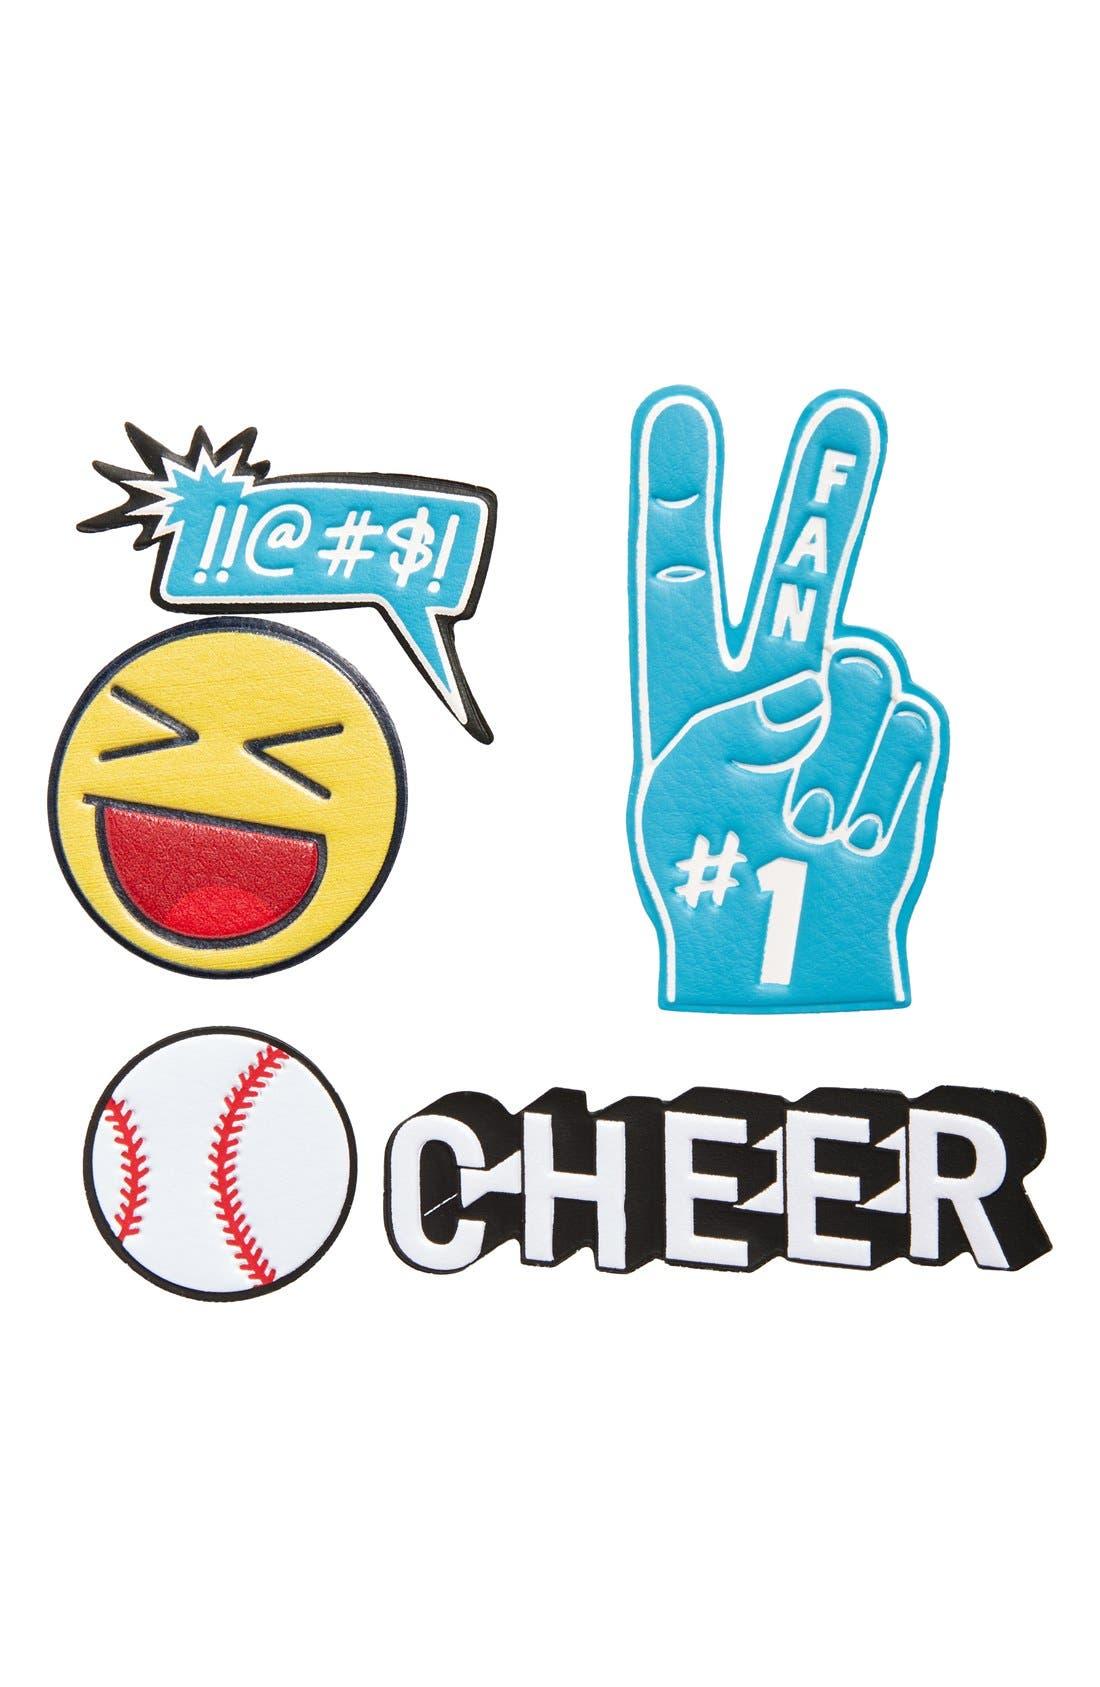 Alternate Image 1 Selected - Skinnydip 'Cheer' Plushie Stickers (Set of 5)